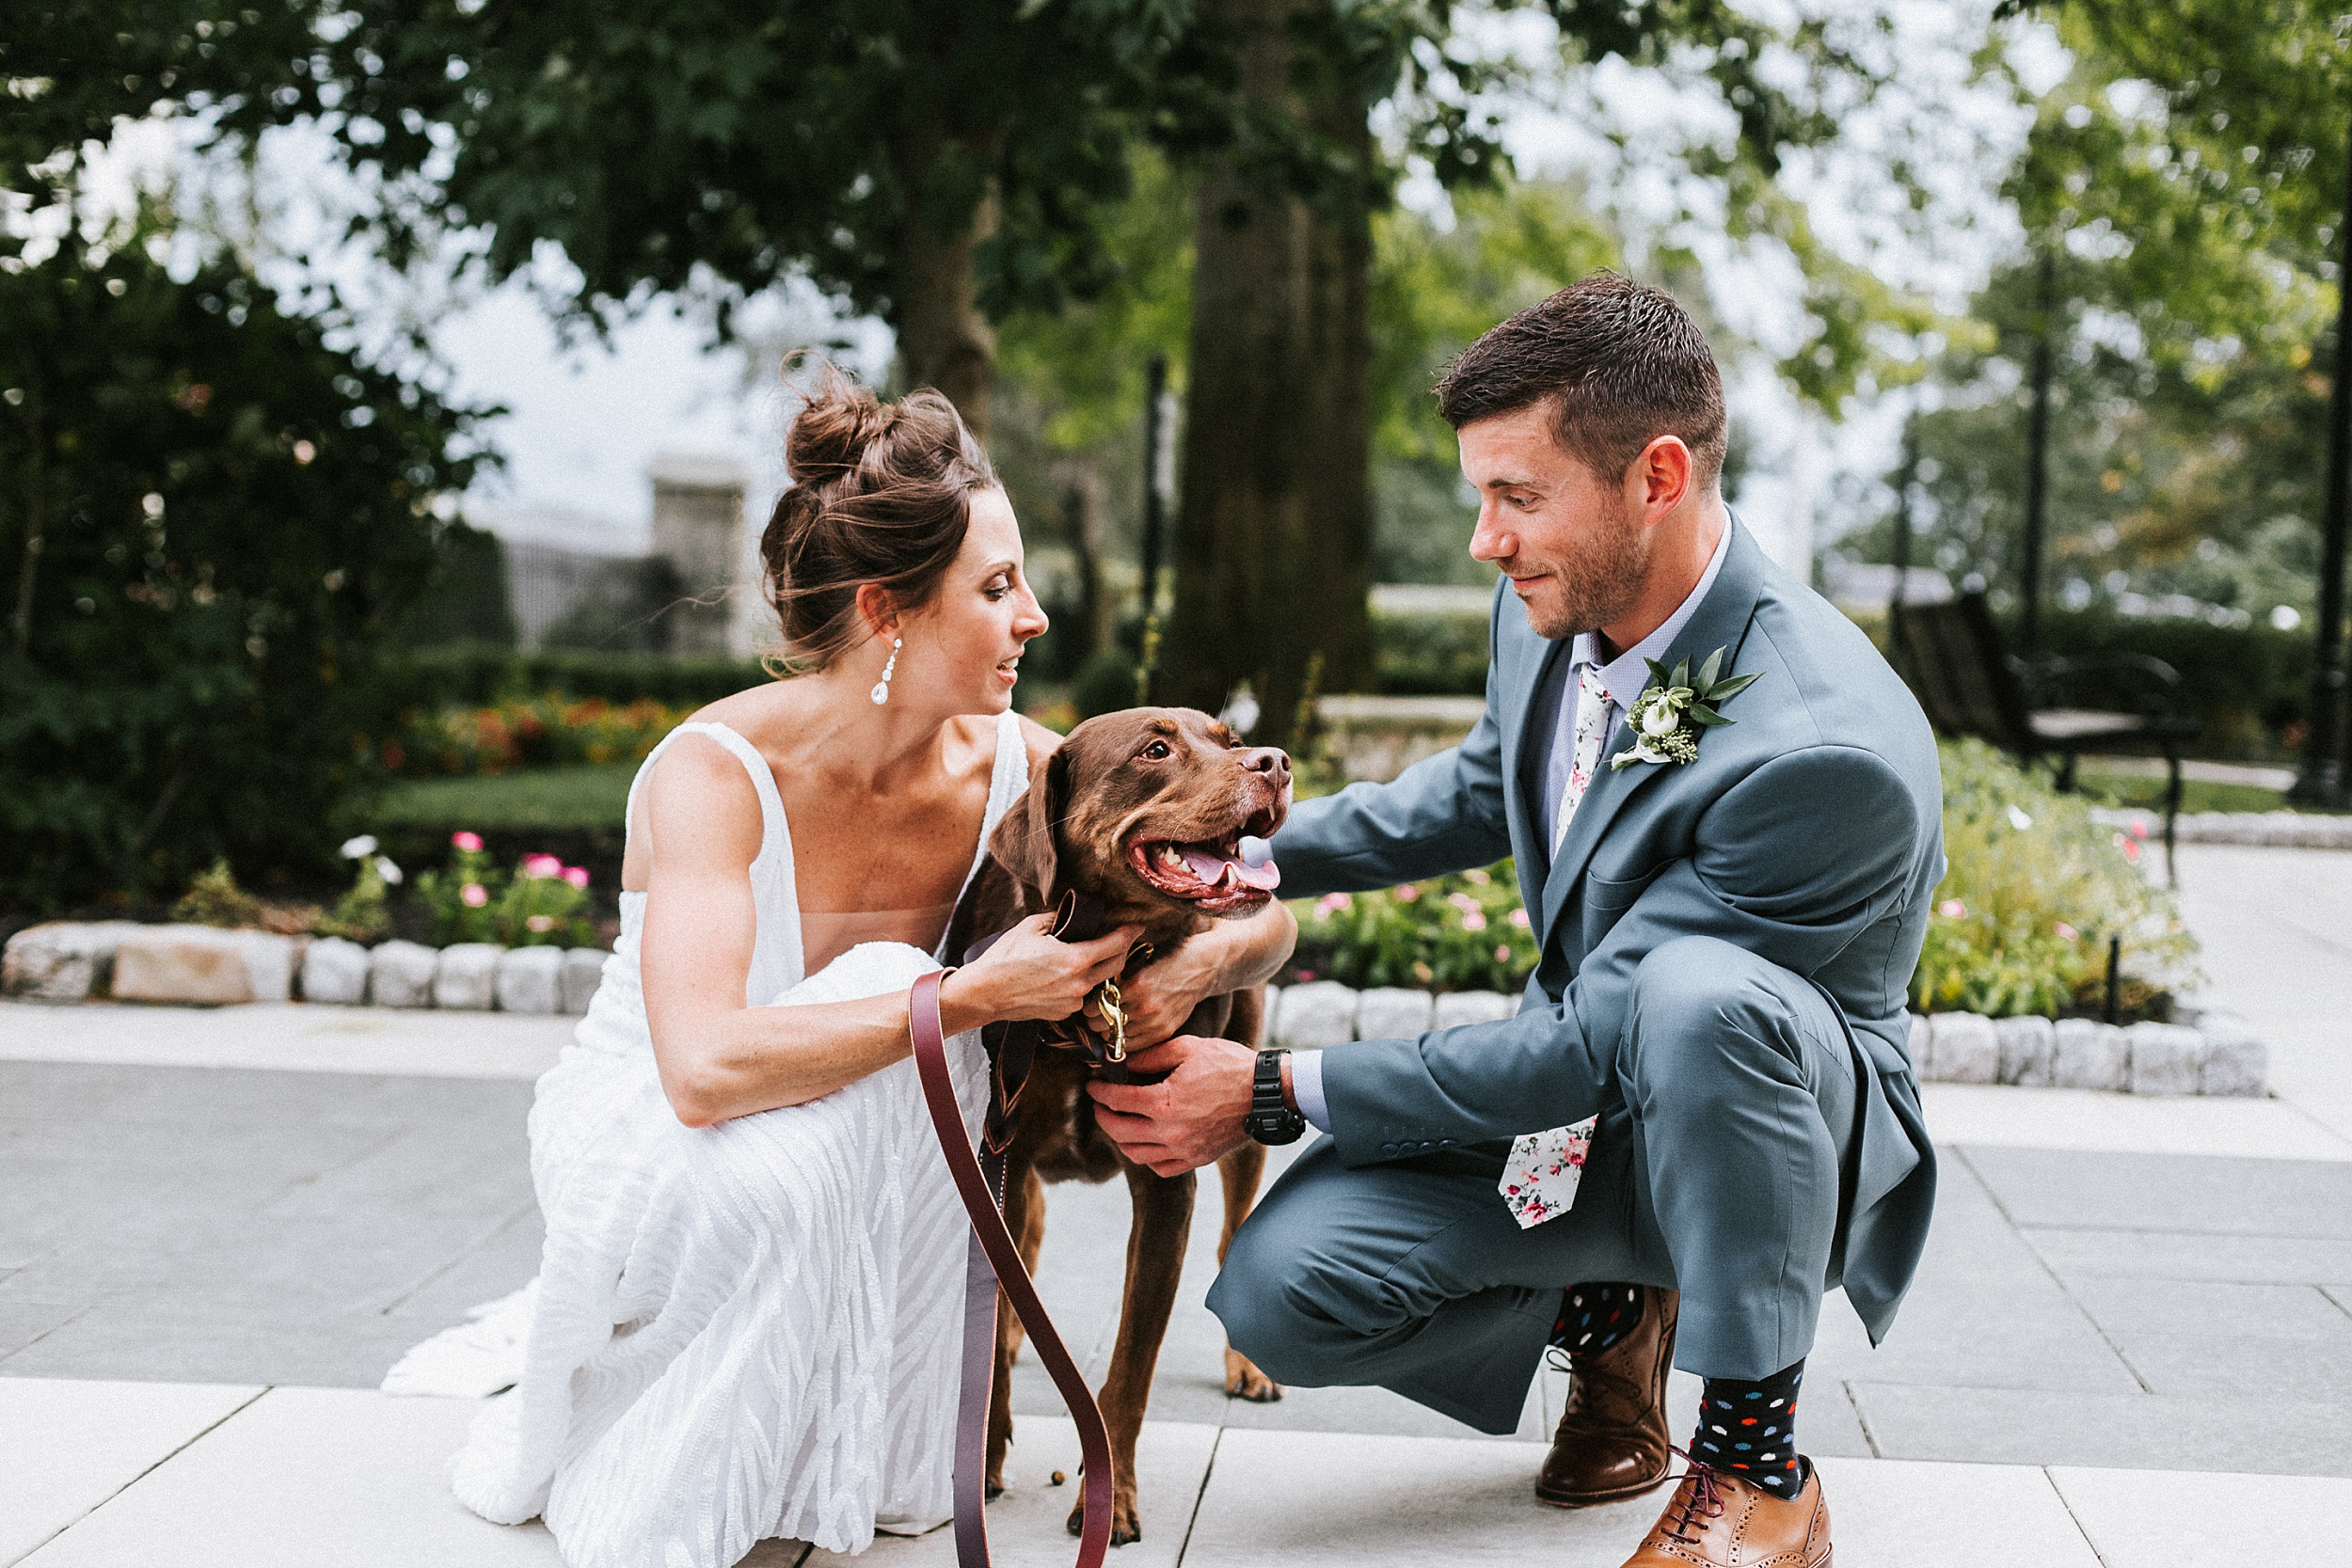 Brooke Townsend Photography - Cincinnati Wedding Photographer (78 of 170).jpg